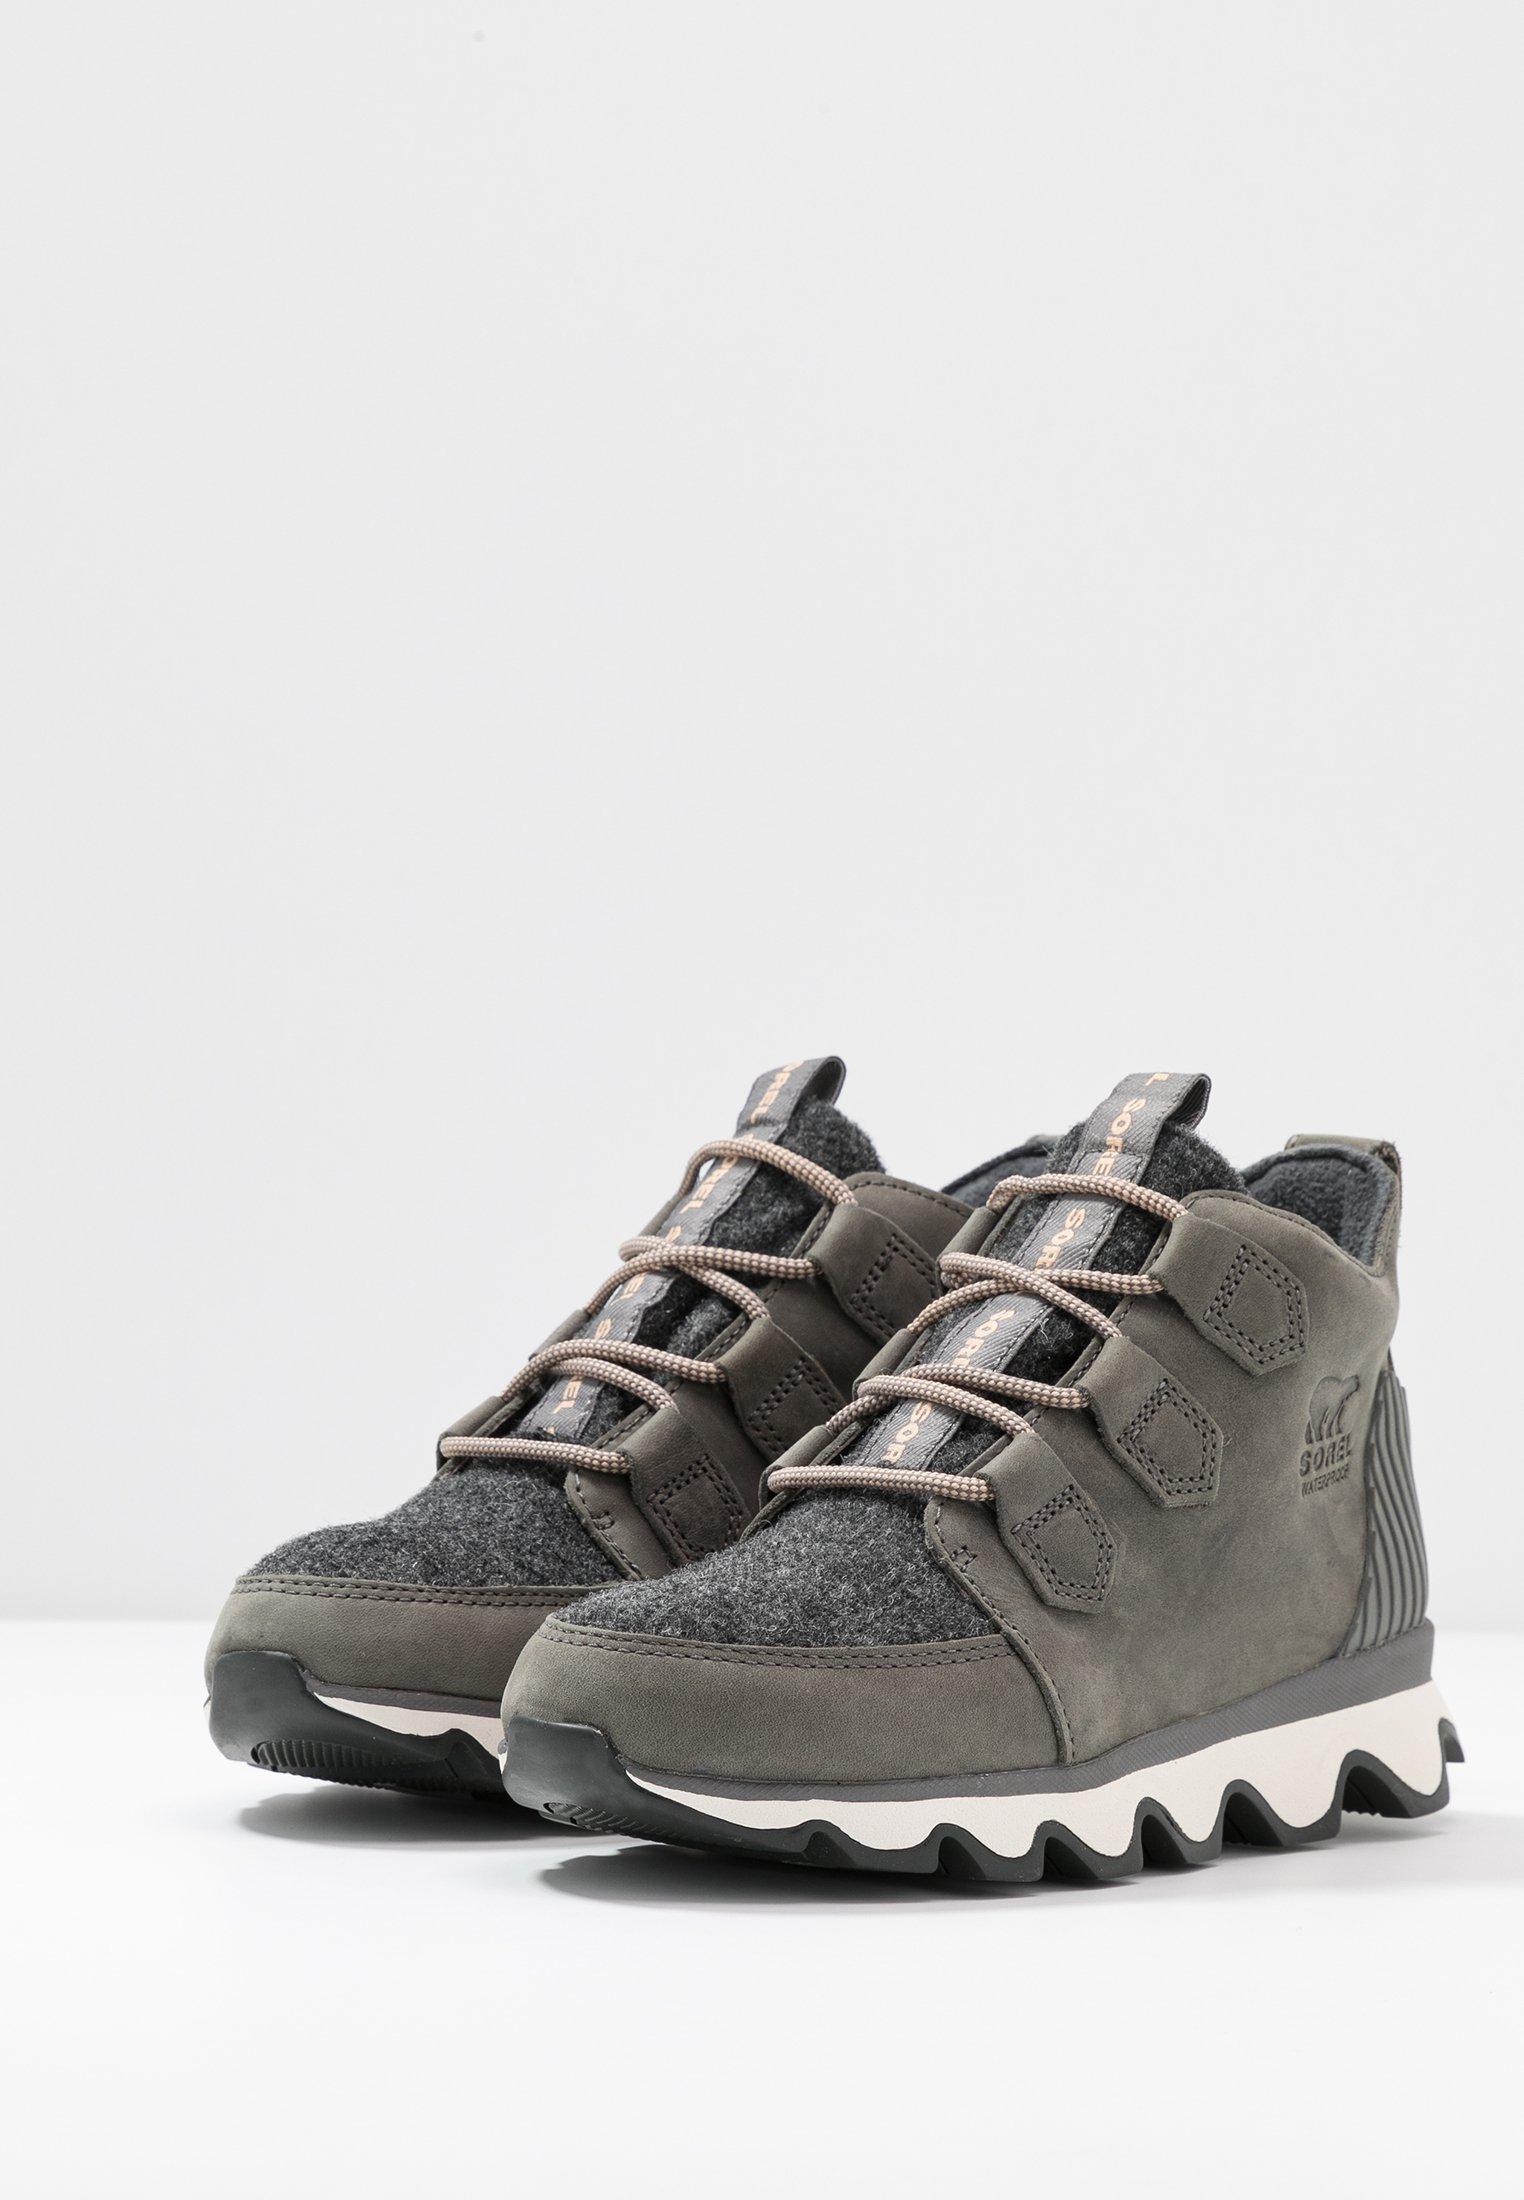 Sorel KINETIC CARIBOU - Ankle Boot quarry